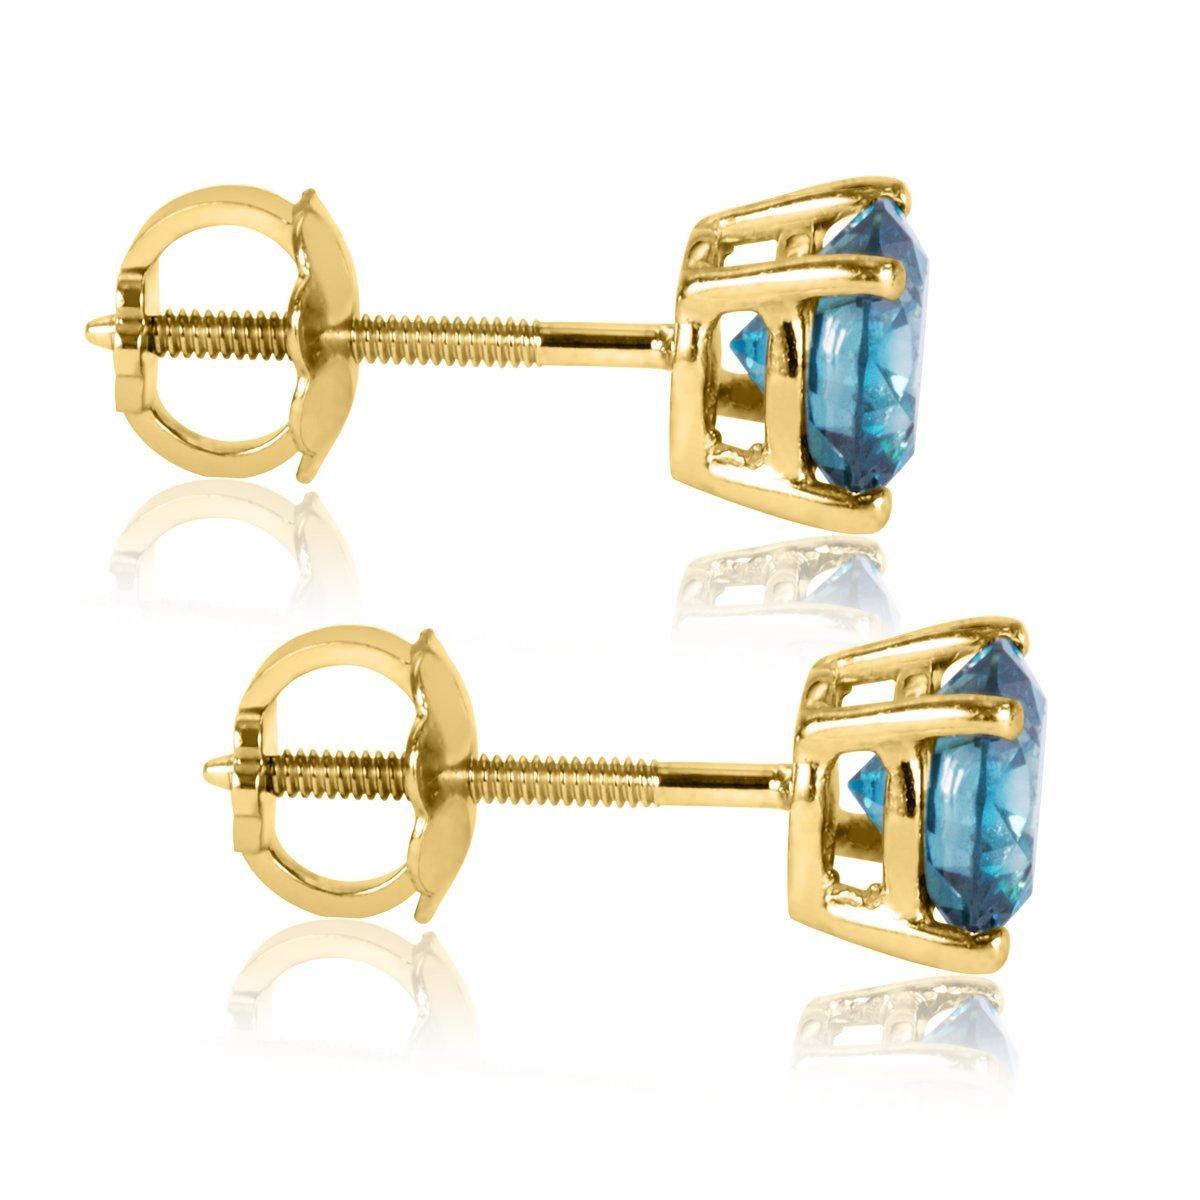 1 6 Carat Premium Blue Diamond Solitaire Screw Back Stud Earrings Pair in 14k